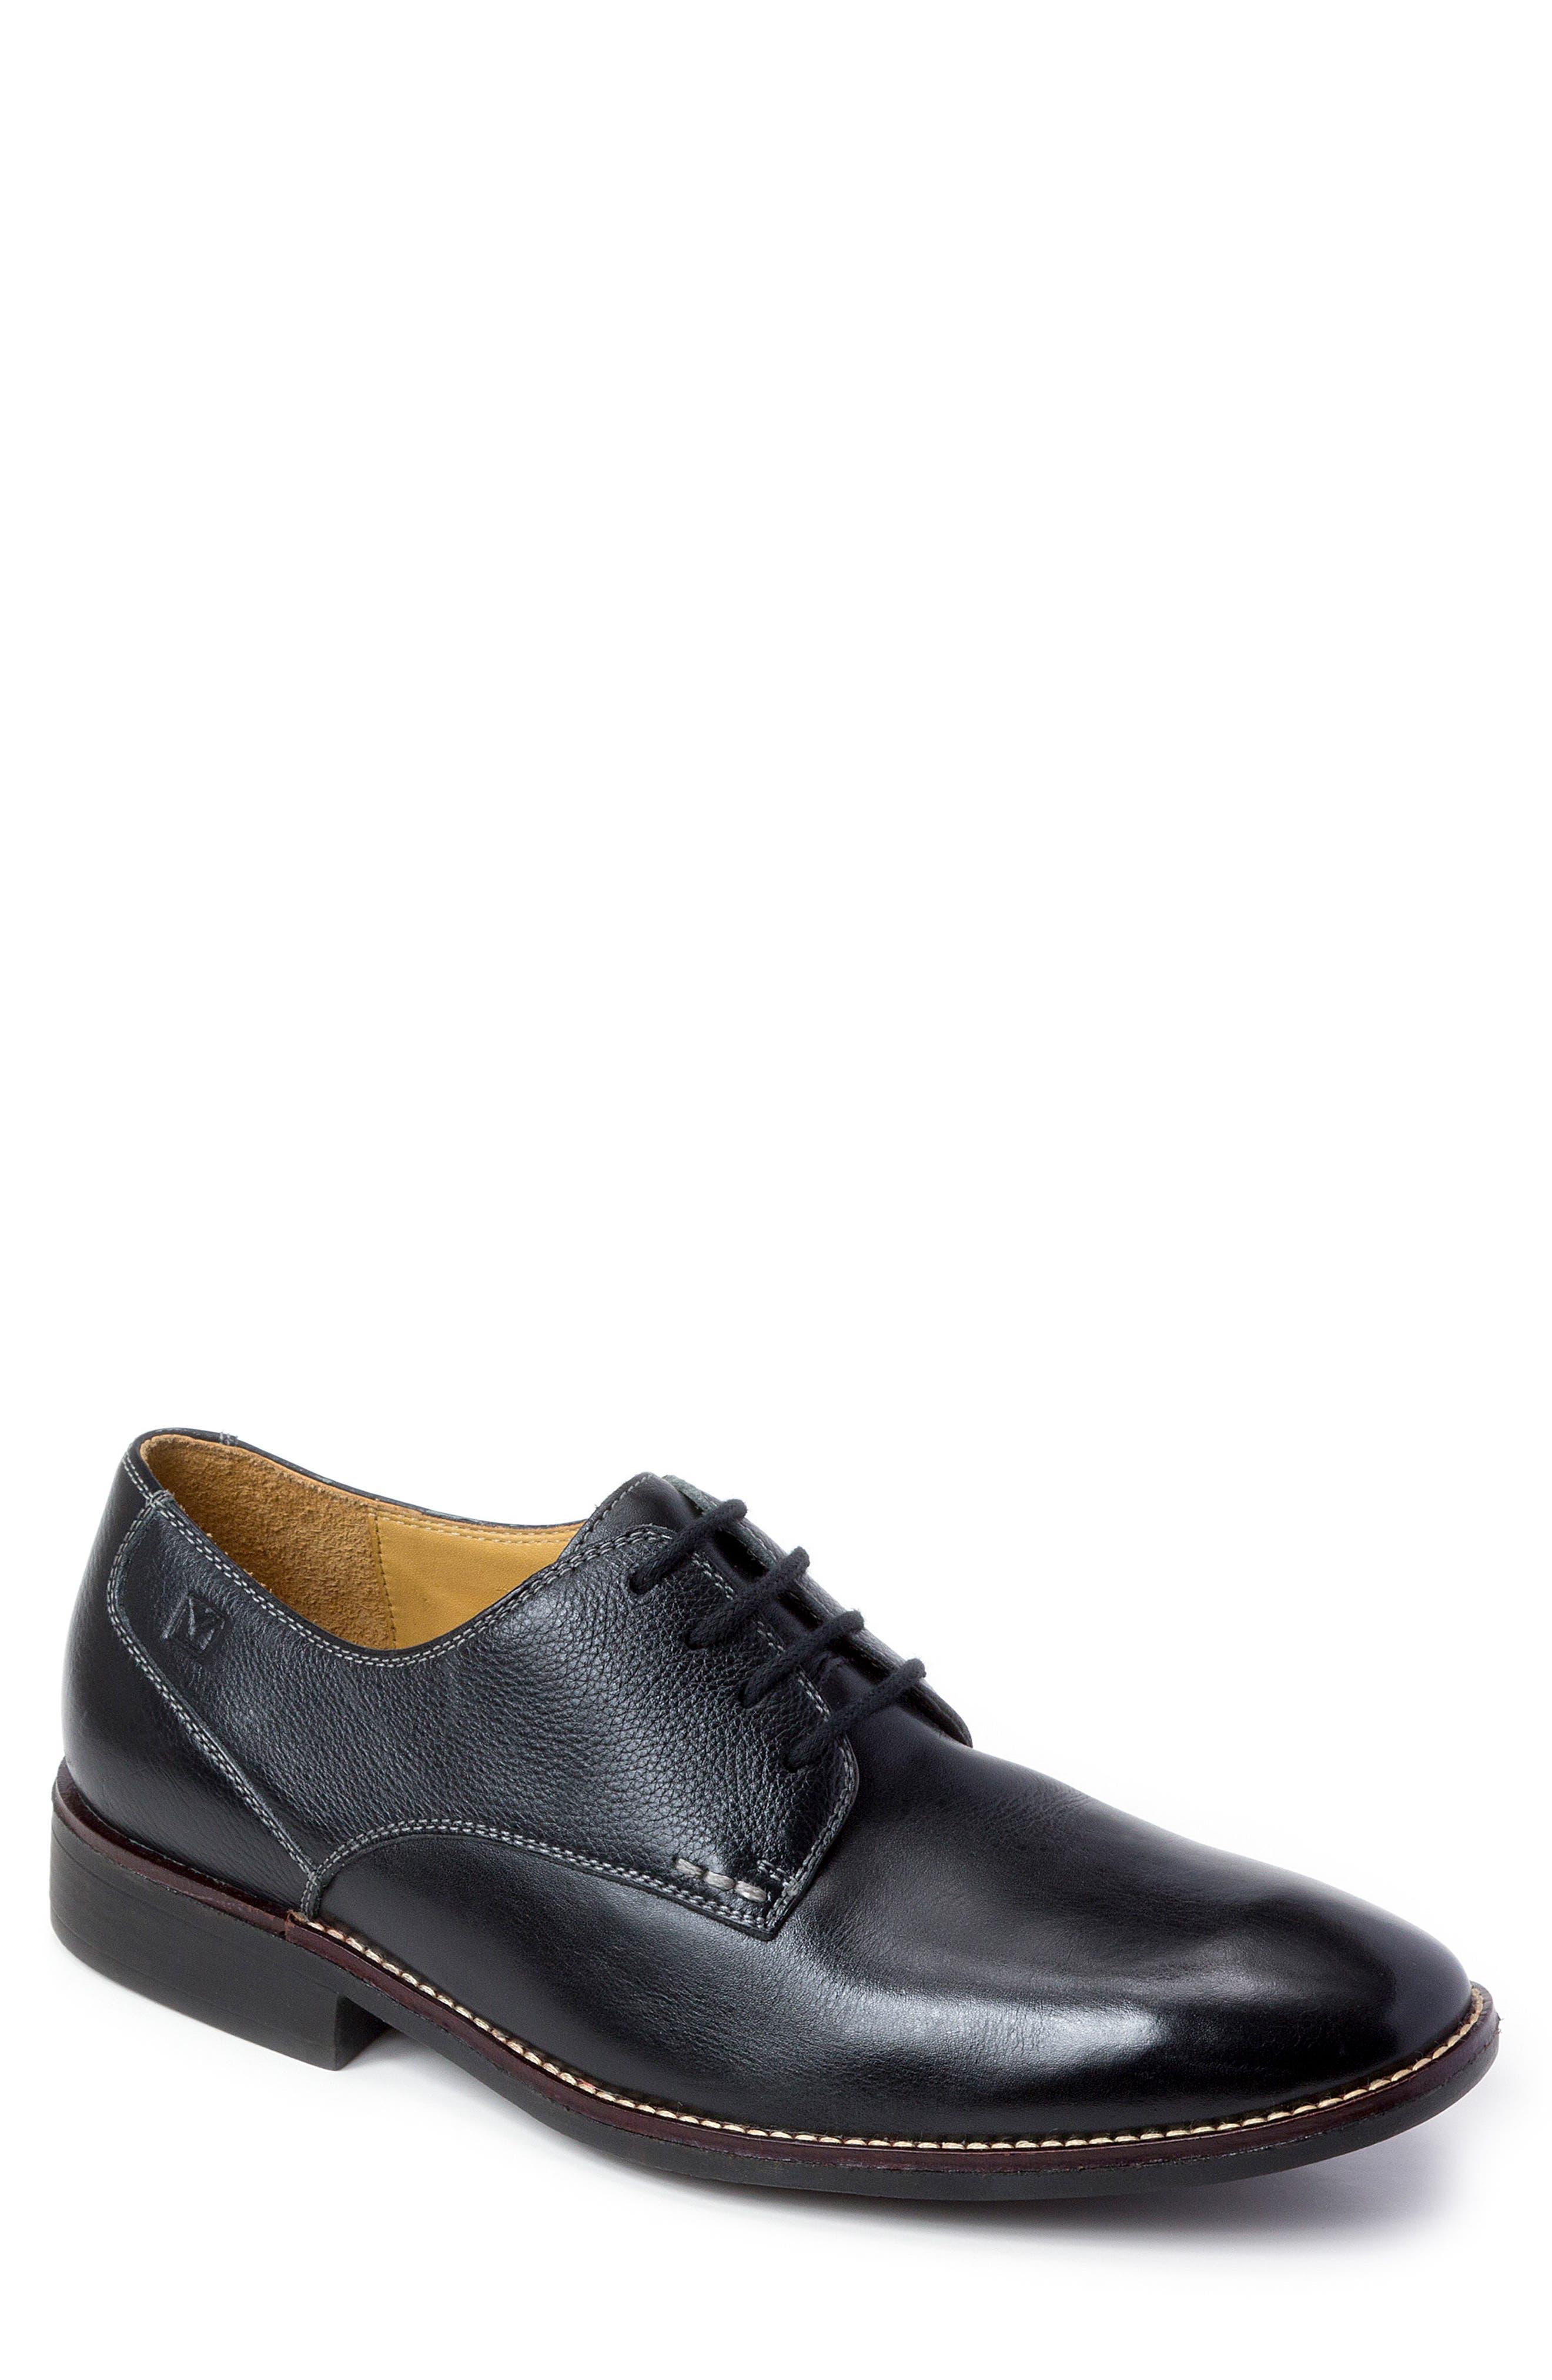 'Olsen' Plain Toe Derby,                         Main,                         color, BLACK LEATHER